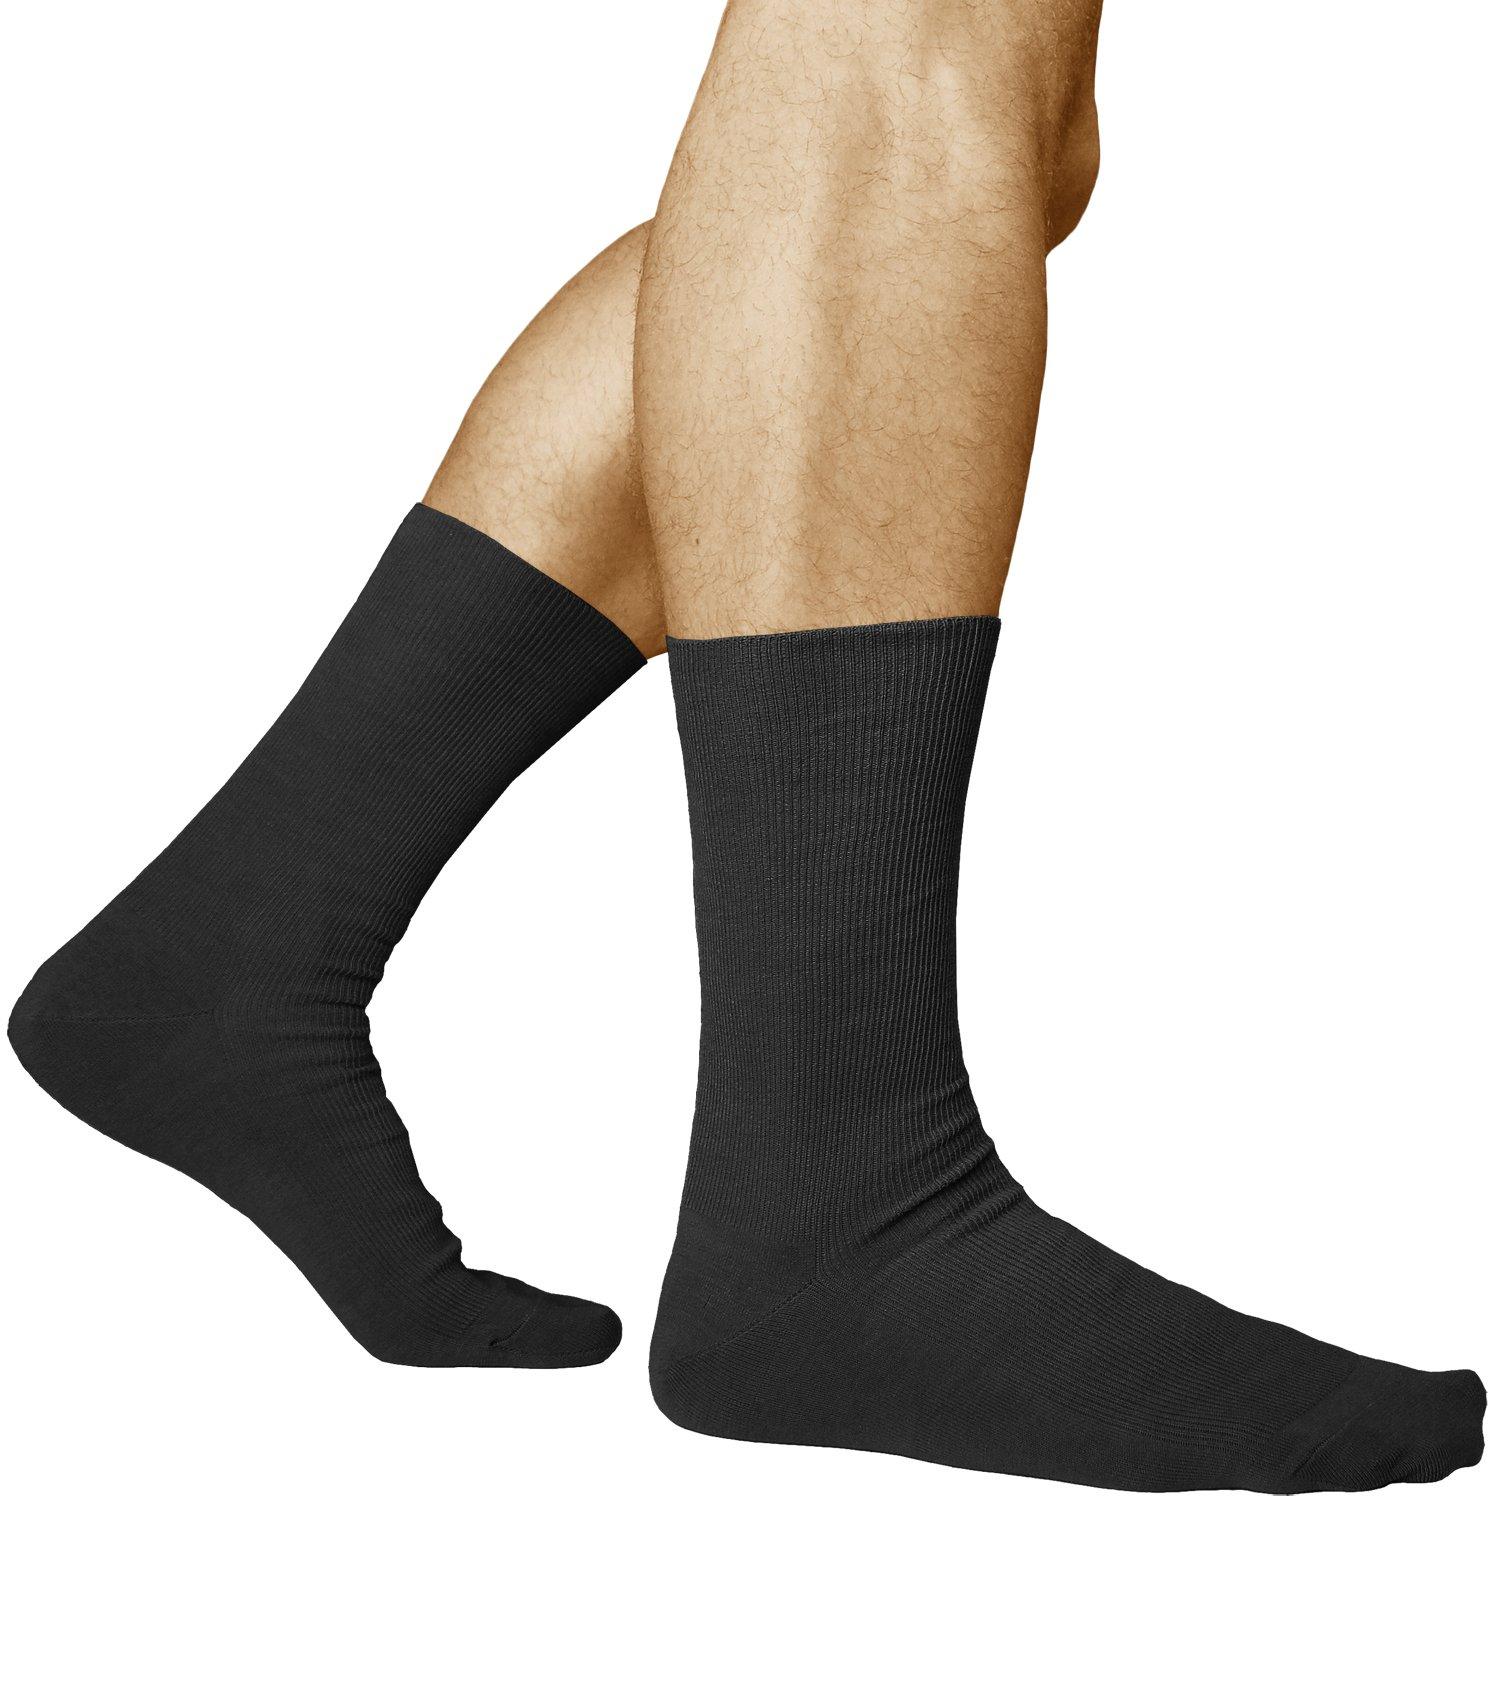 3 Pairs Men's Loose Top Non Elastic Socks for Tired Sore Feet, Combed Cotton, Vitsocks Health, 12-13, black